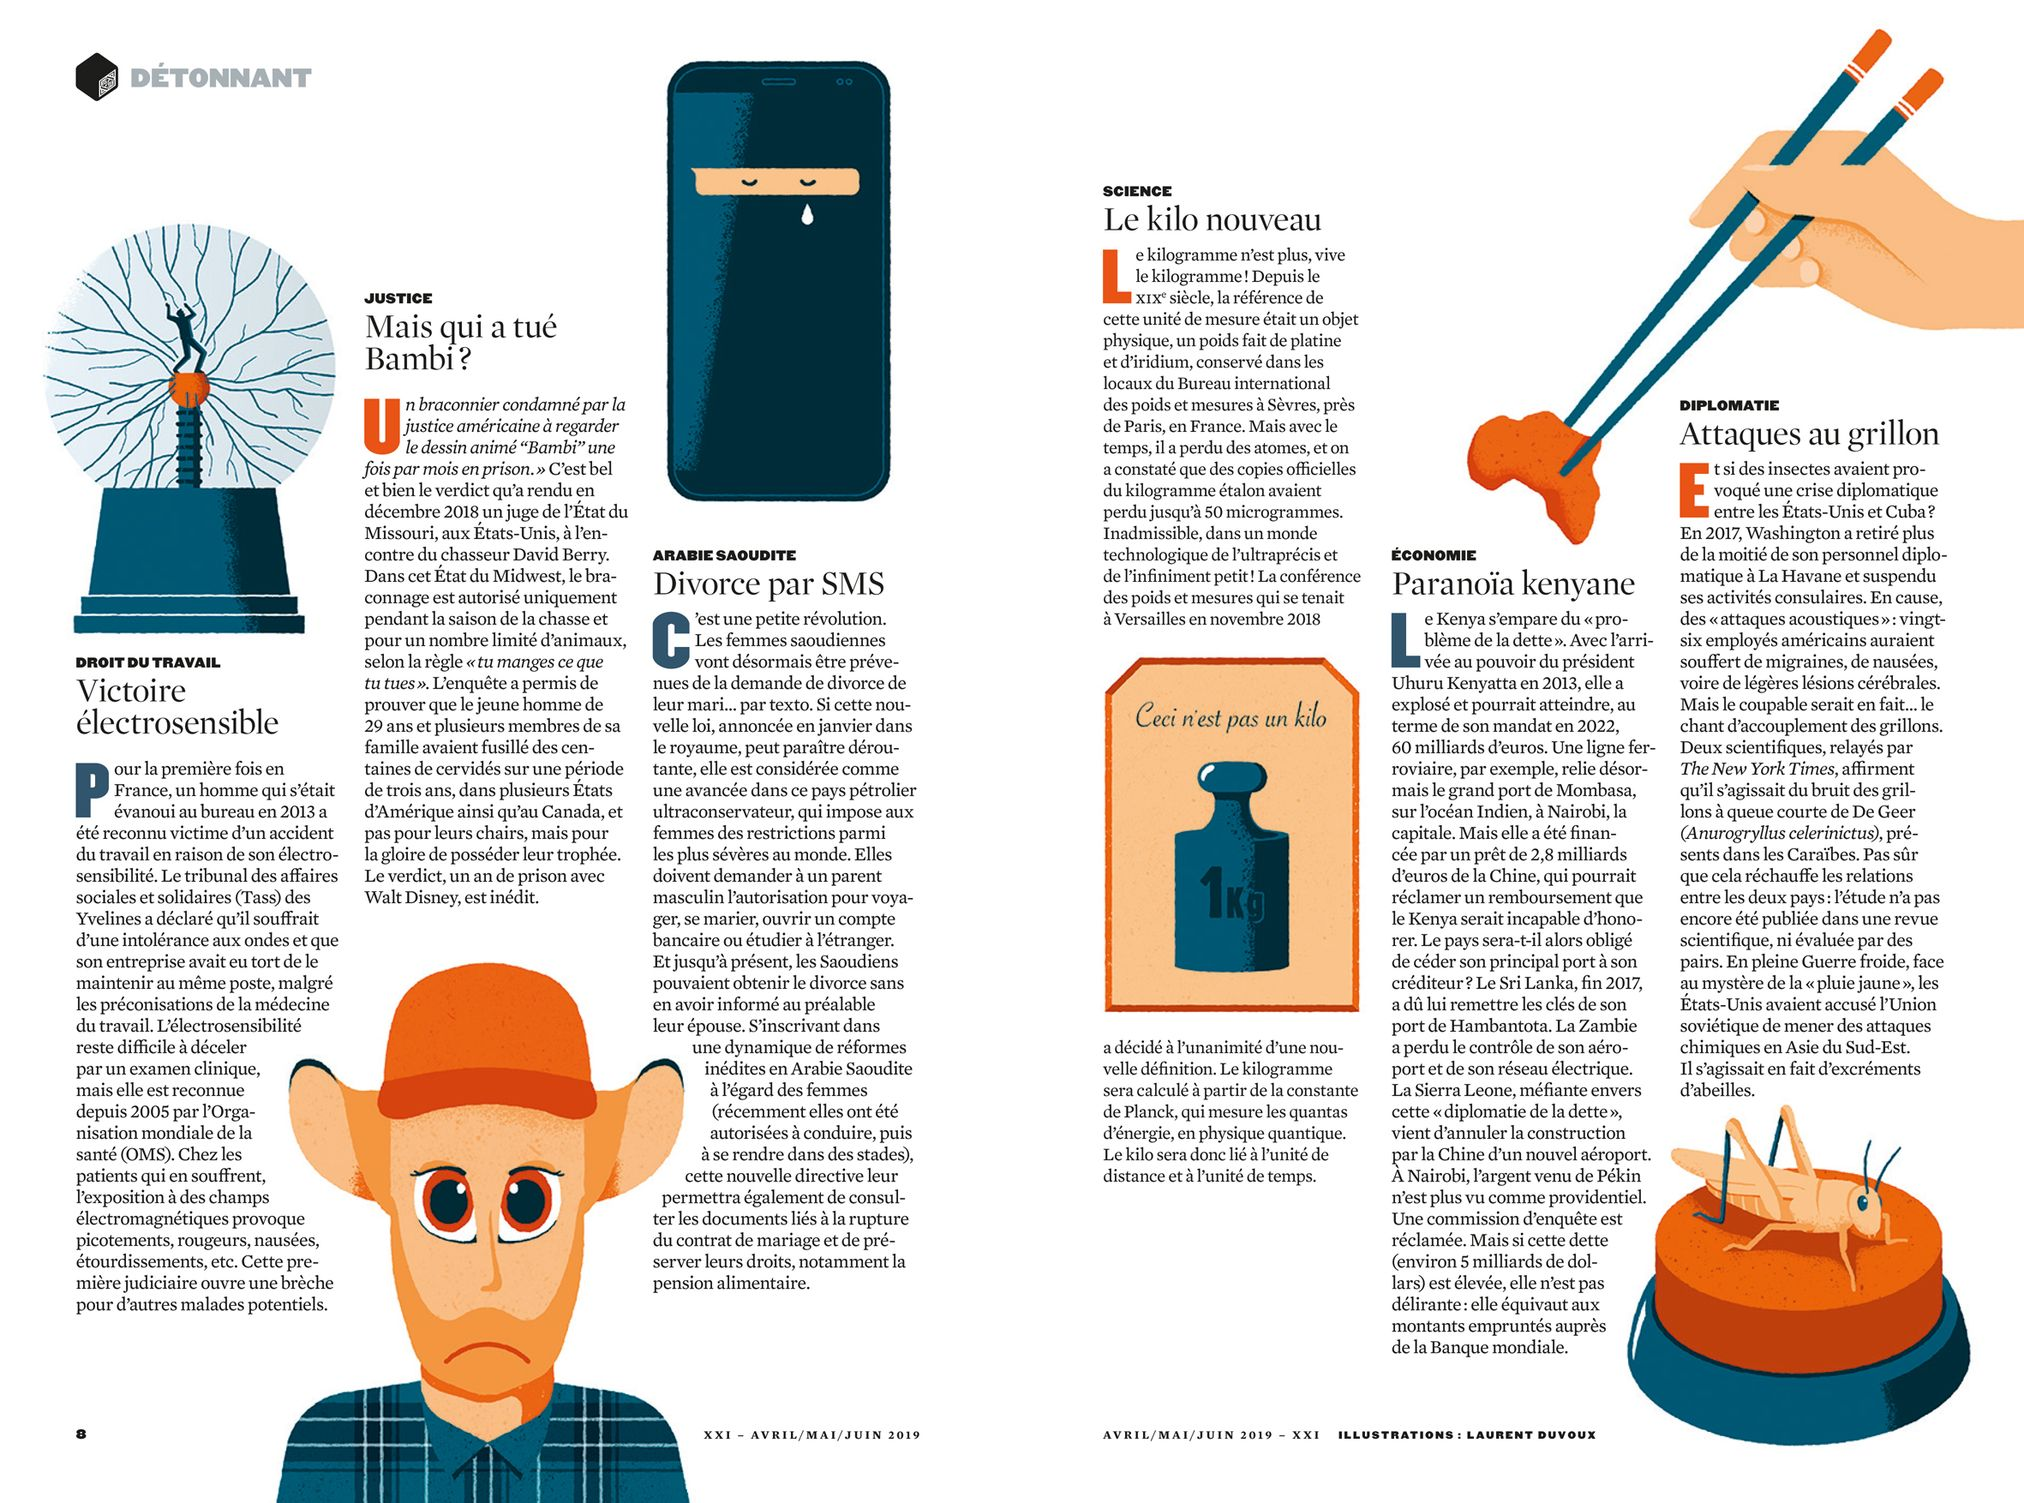 garance-illustration-XXI-News-of-the-world-_web